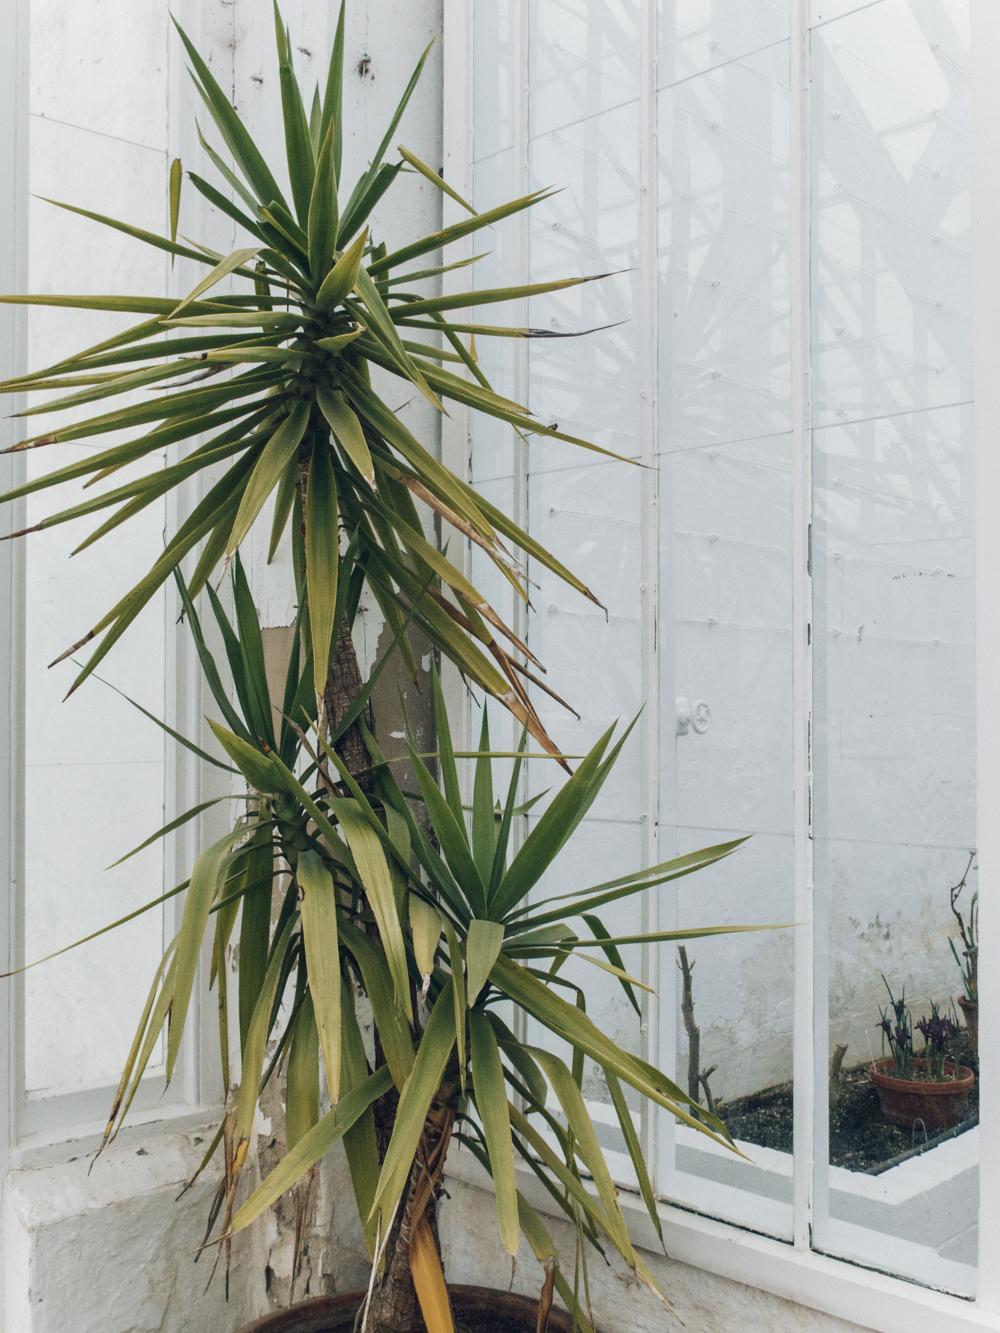 Haarkon Clumber Park Sherwood Forest National Trust Glasshouse Greenhouse Garden Plants Palm Yucca